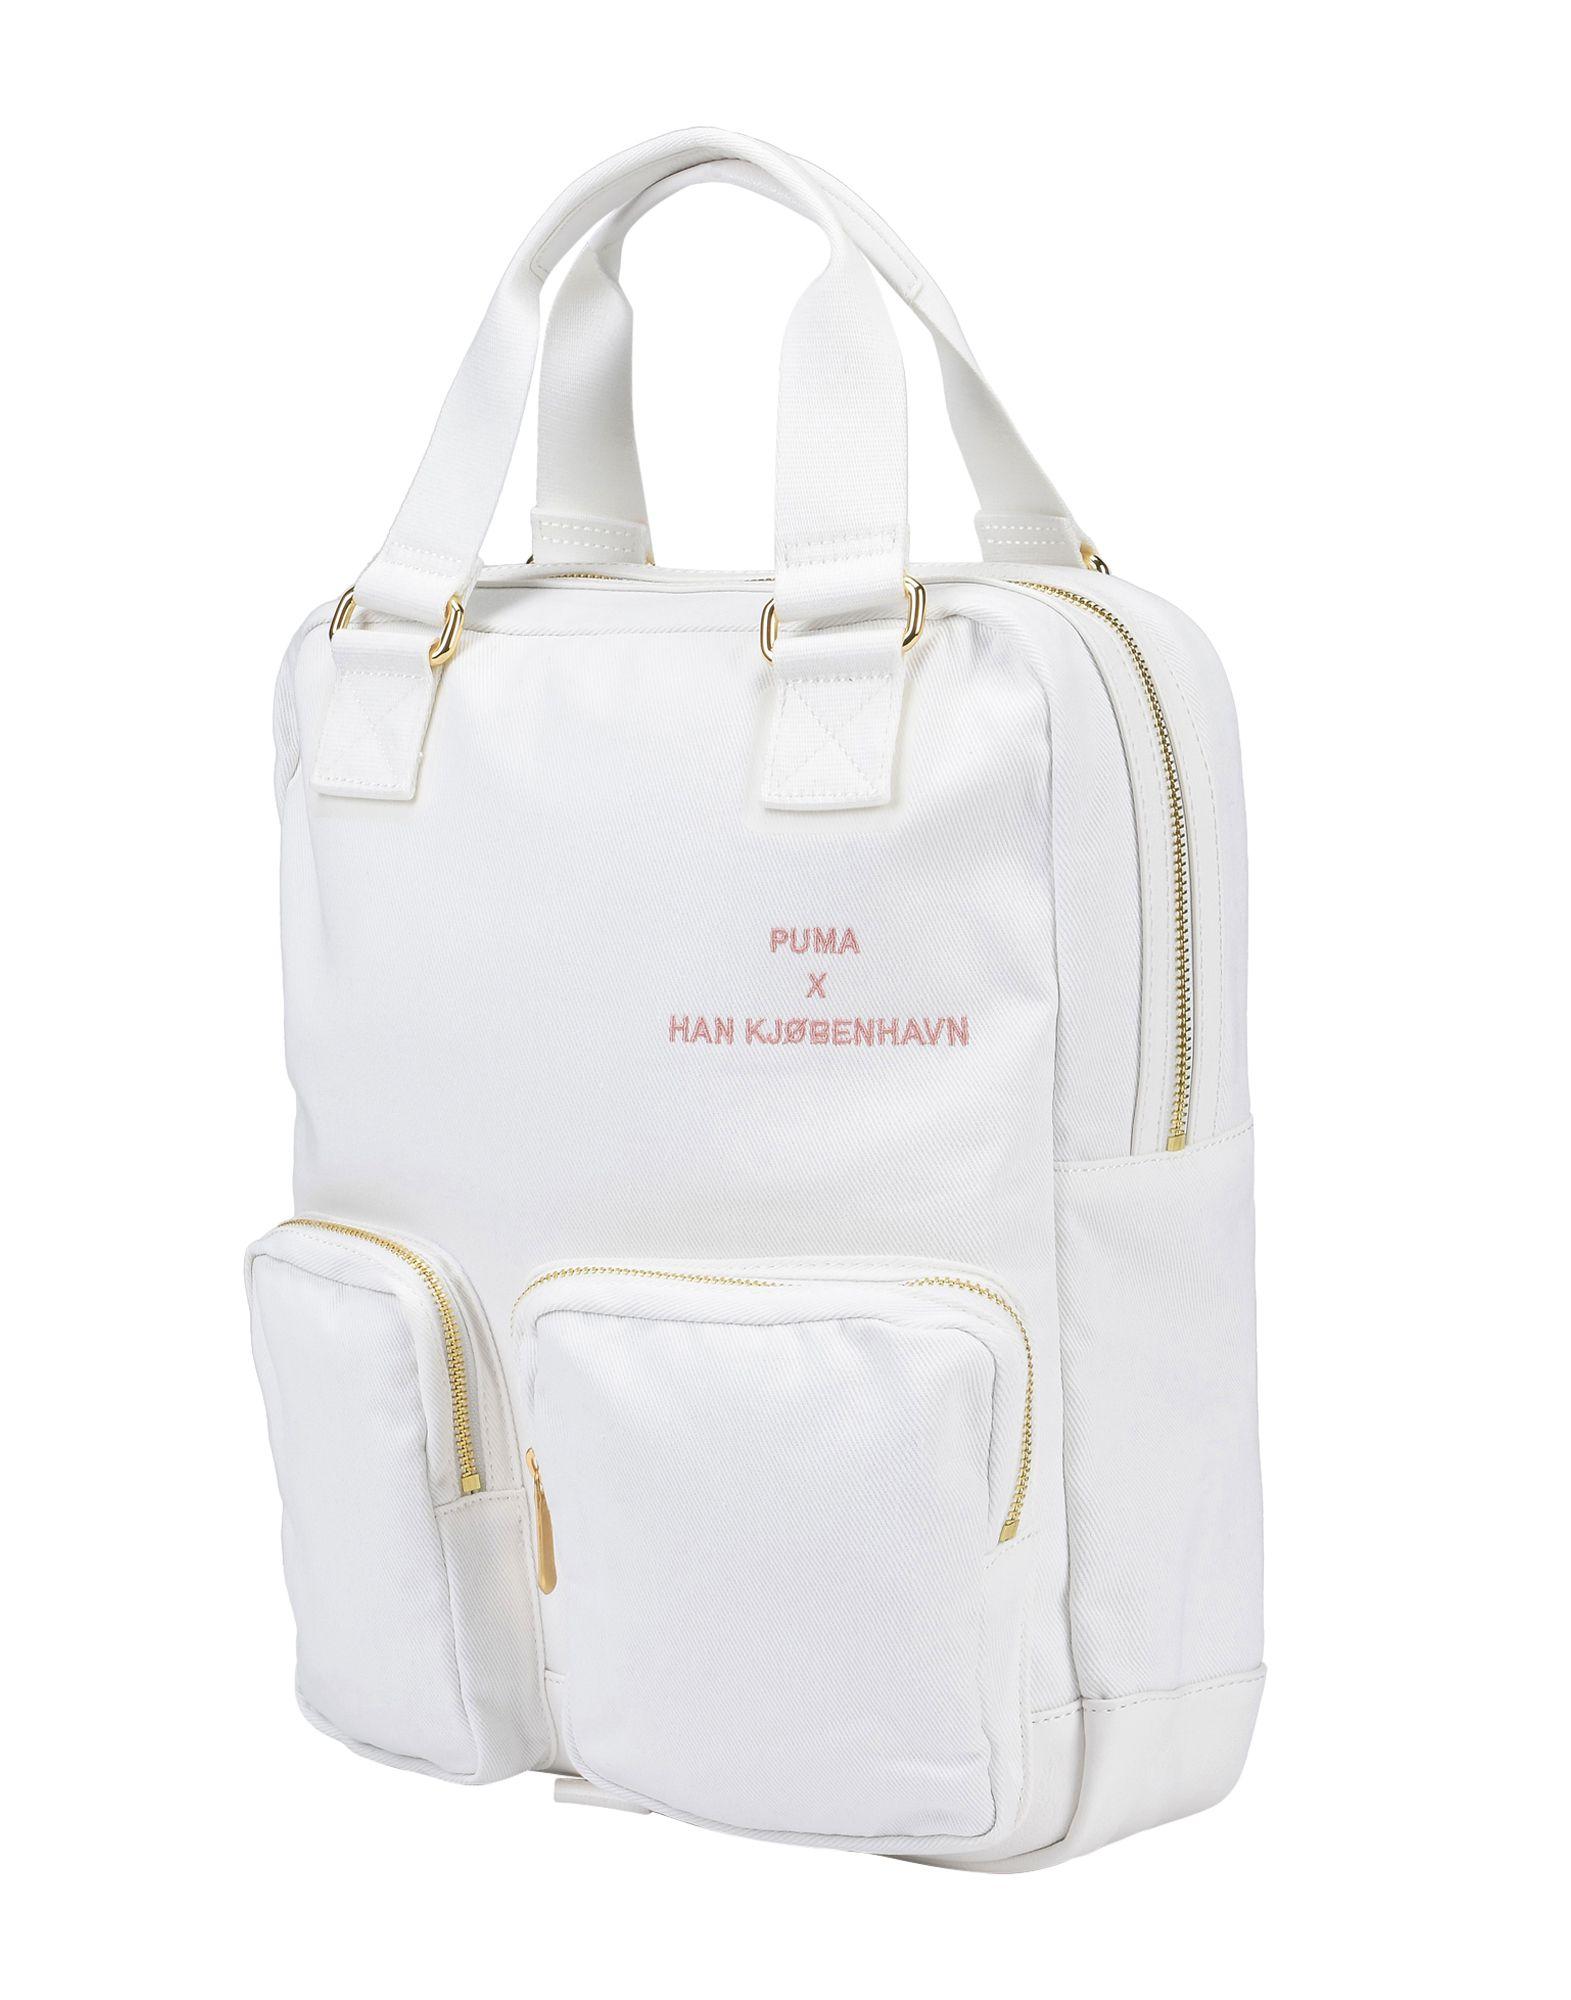 PUMA x HAN KJØBENHAVN Рюкзаки и сумки на пояс puma x han kjøbenhavn толстовка